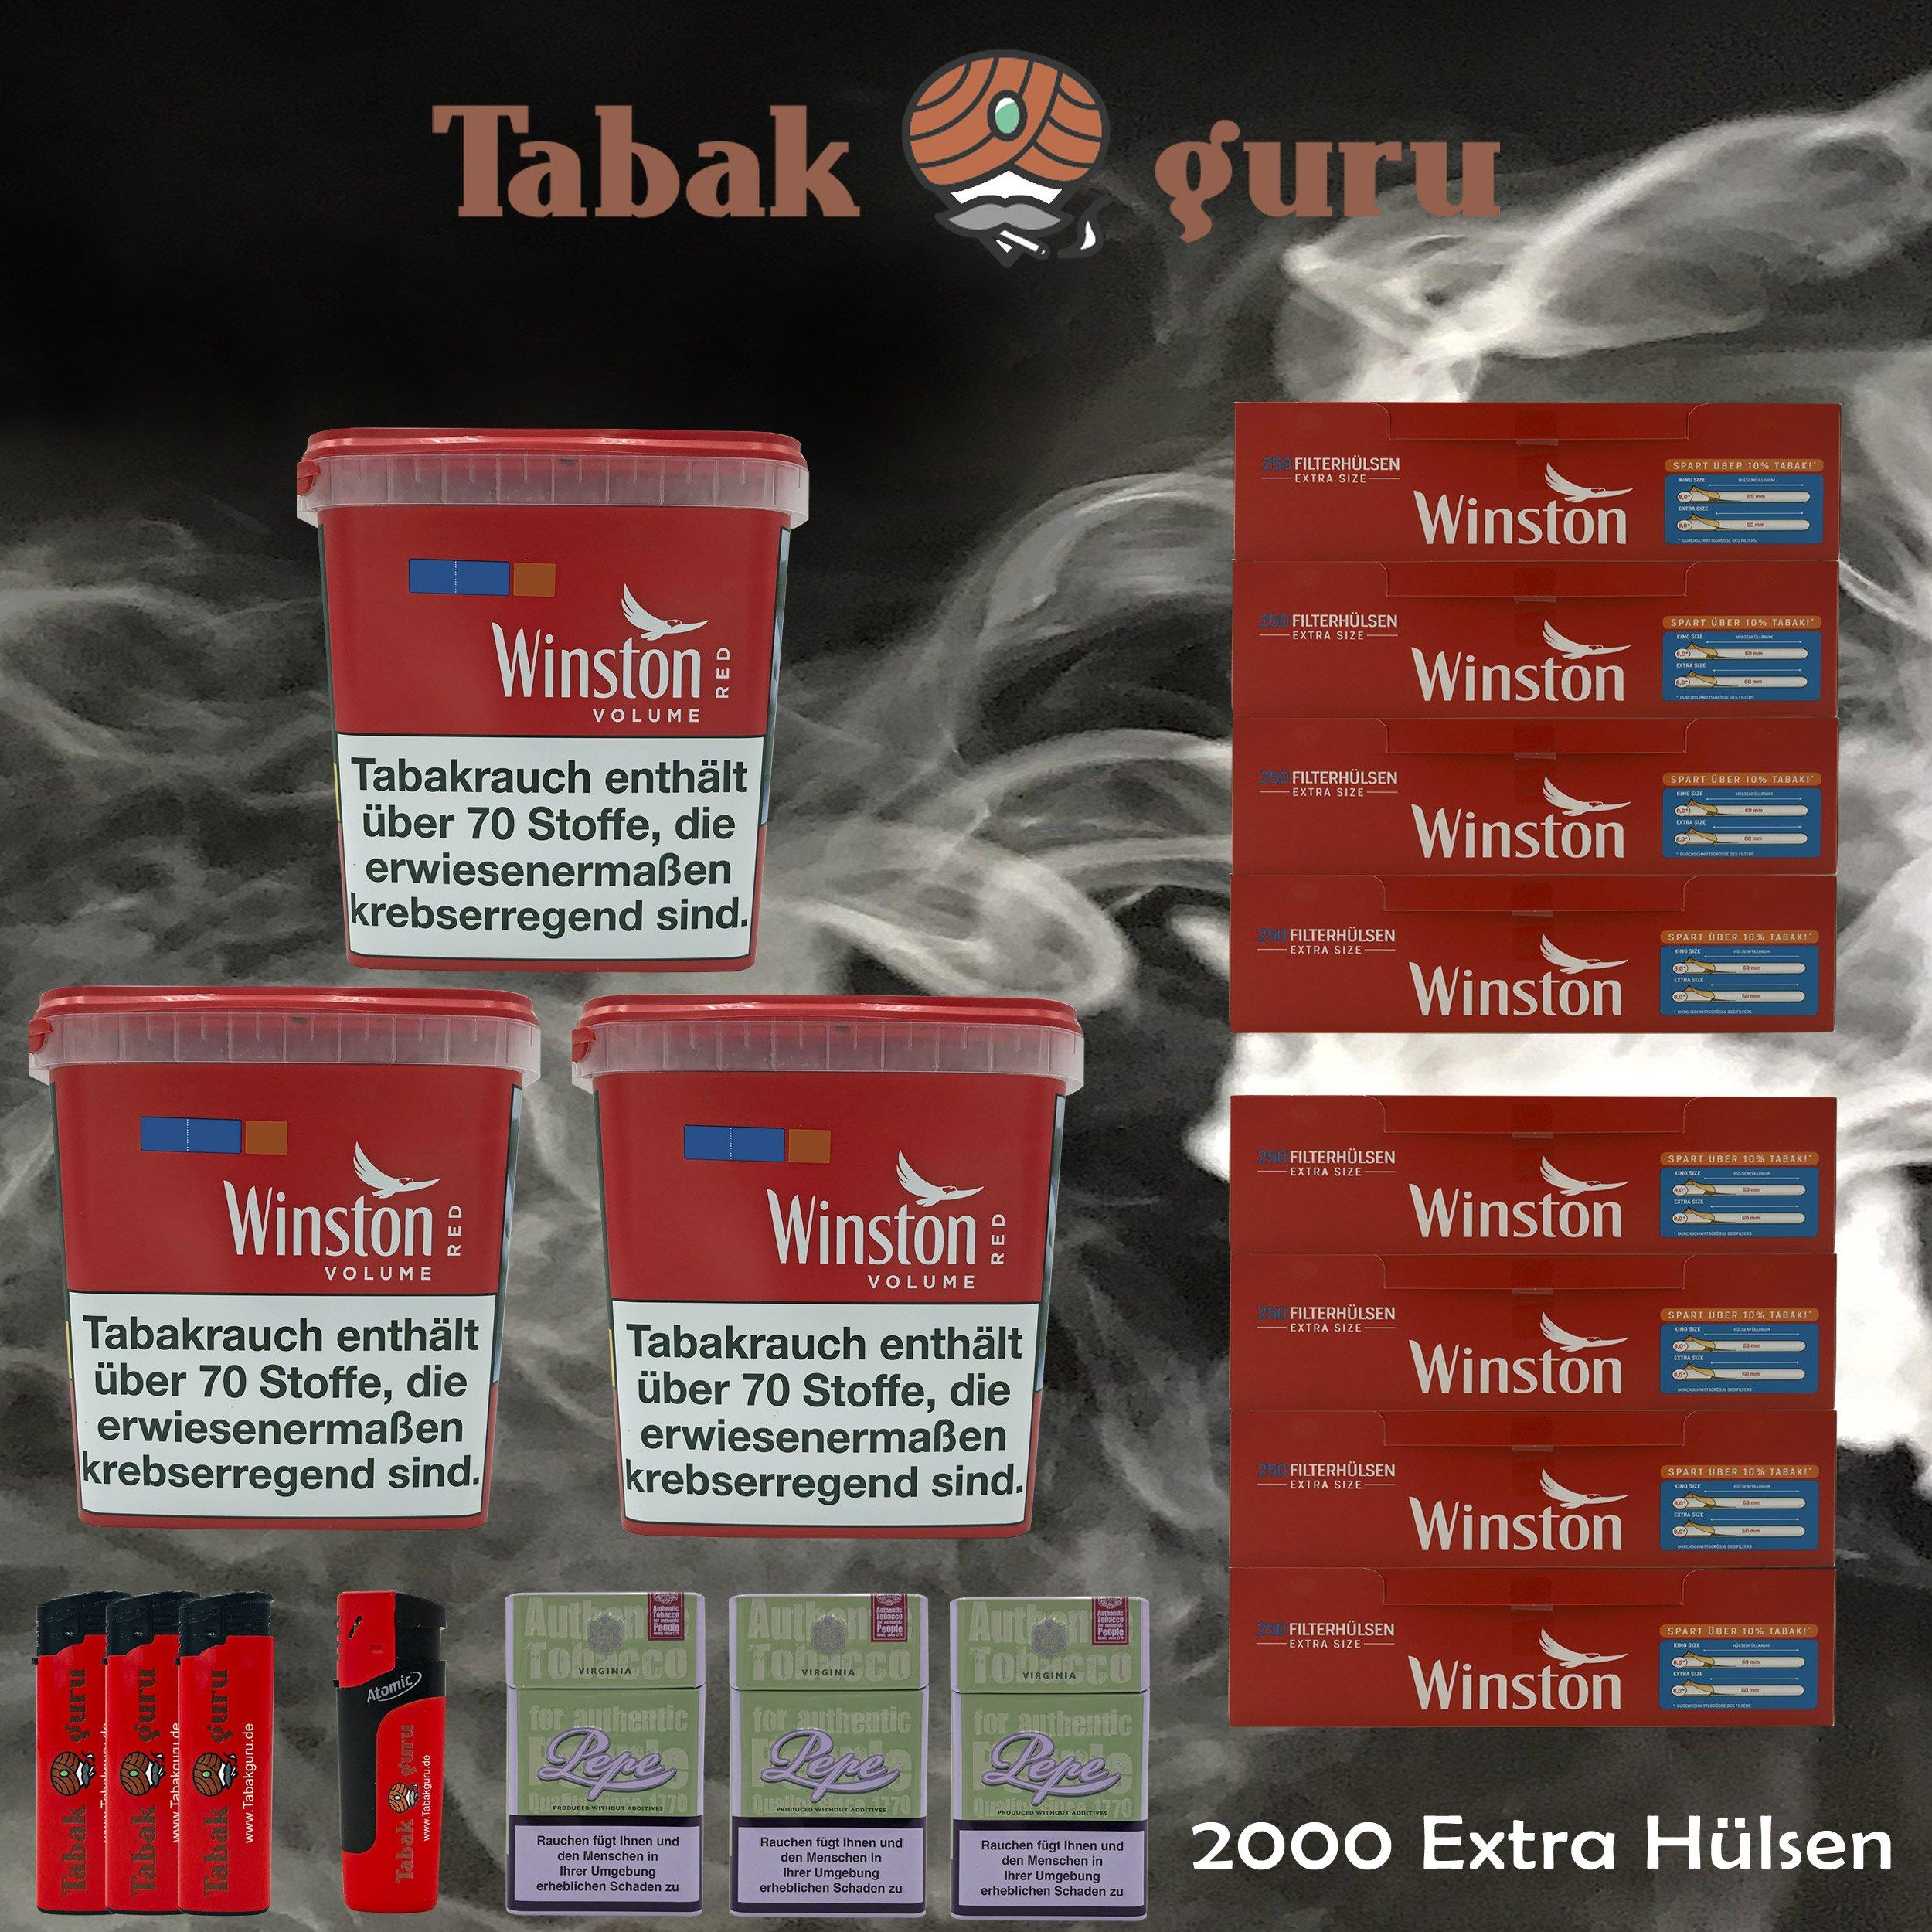 3x Winston Classic Red/Rot Giant Box 280g Volumentabak, 2000 Extra Hülsen, Zubehör